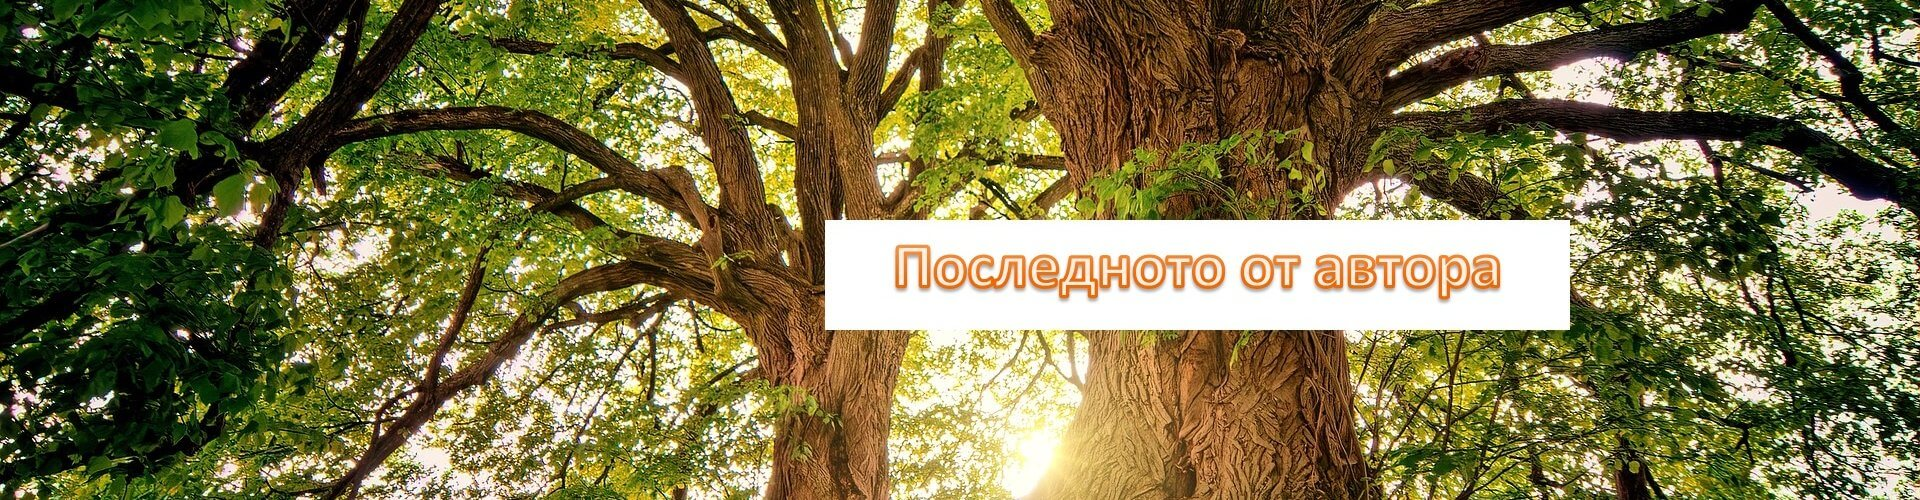 Последното издадено произведение от психолога Христо Гешанов